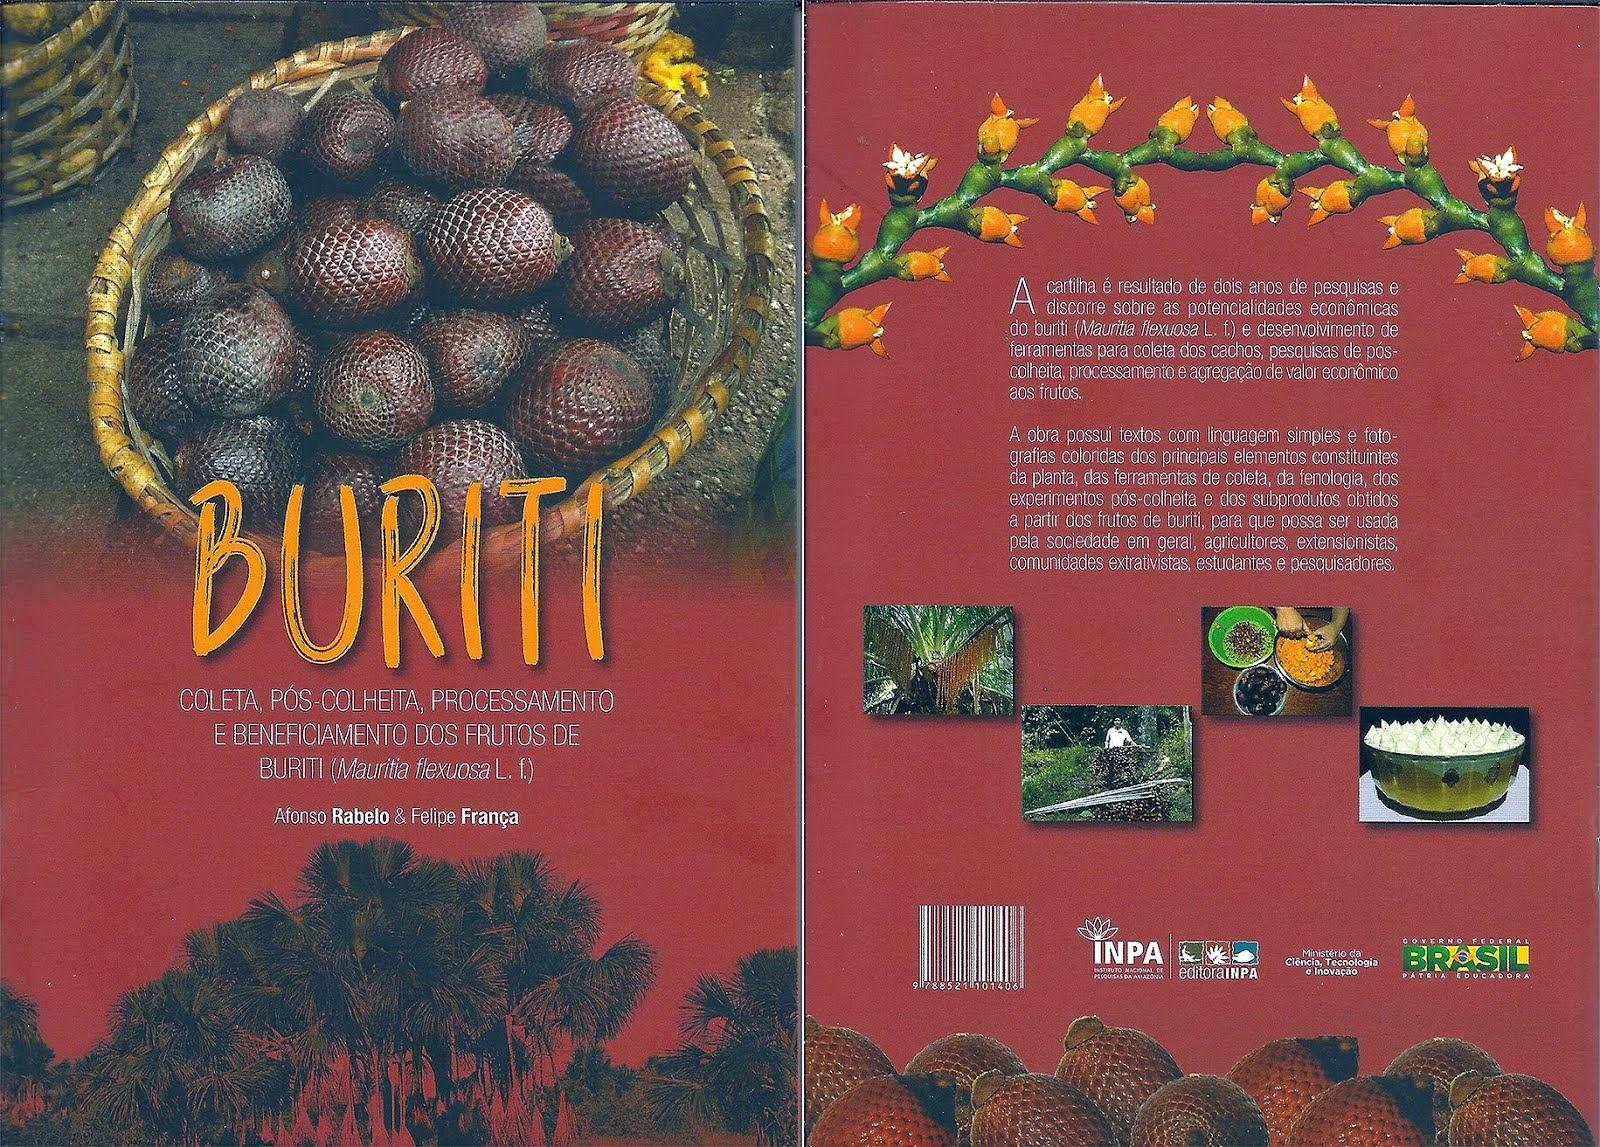 Publicada pela Editora Inpa a Cartilha Buriti